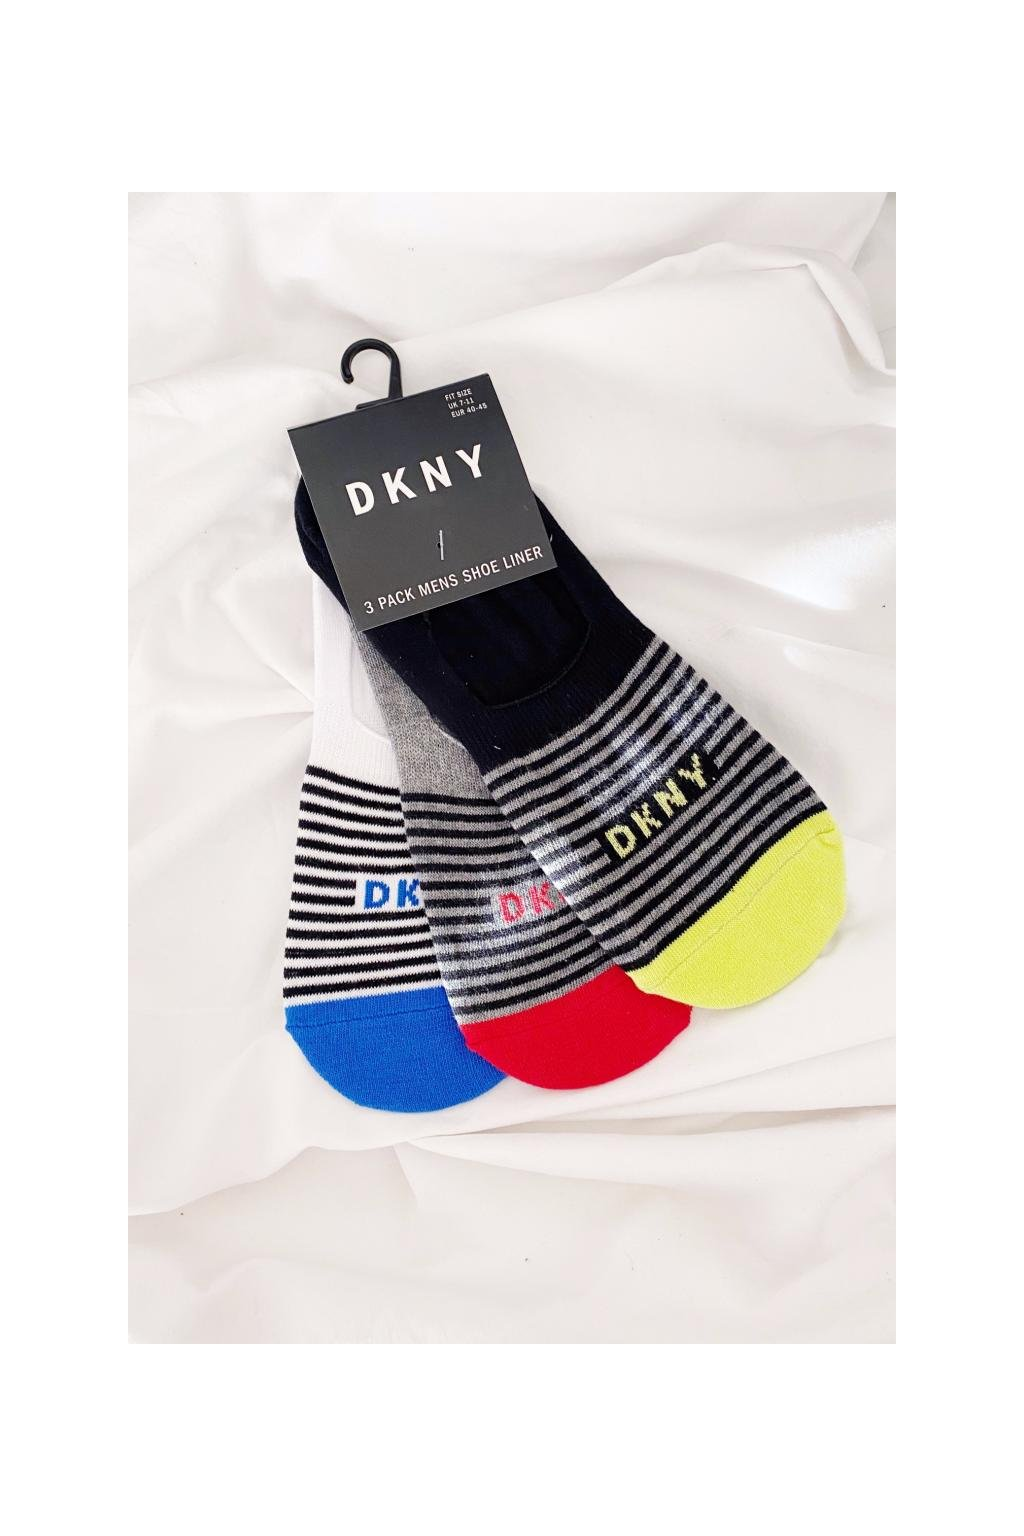 DKNY 3-balení ponožek pánské - šedá, bílá